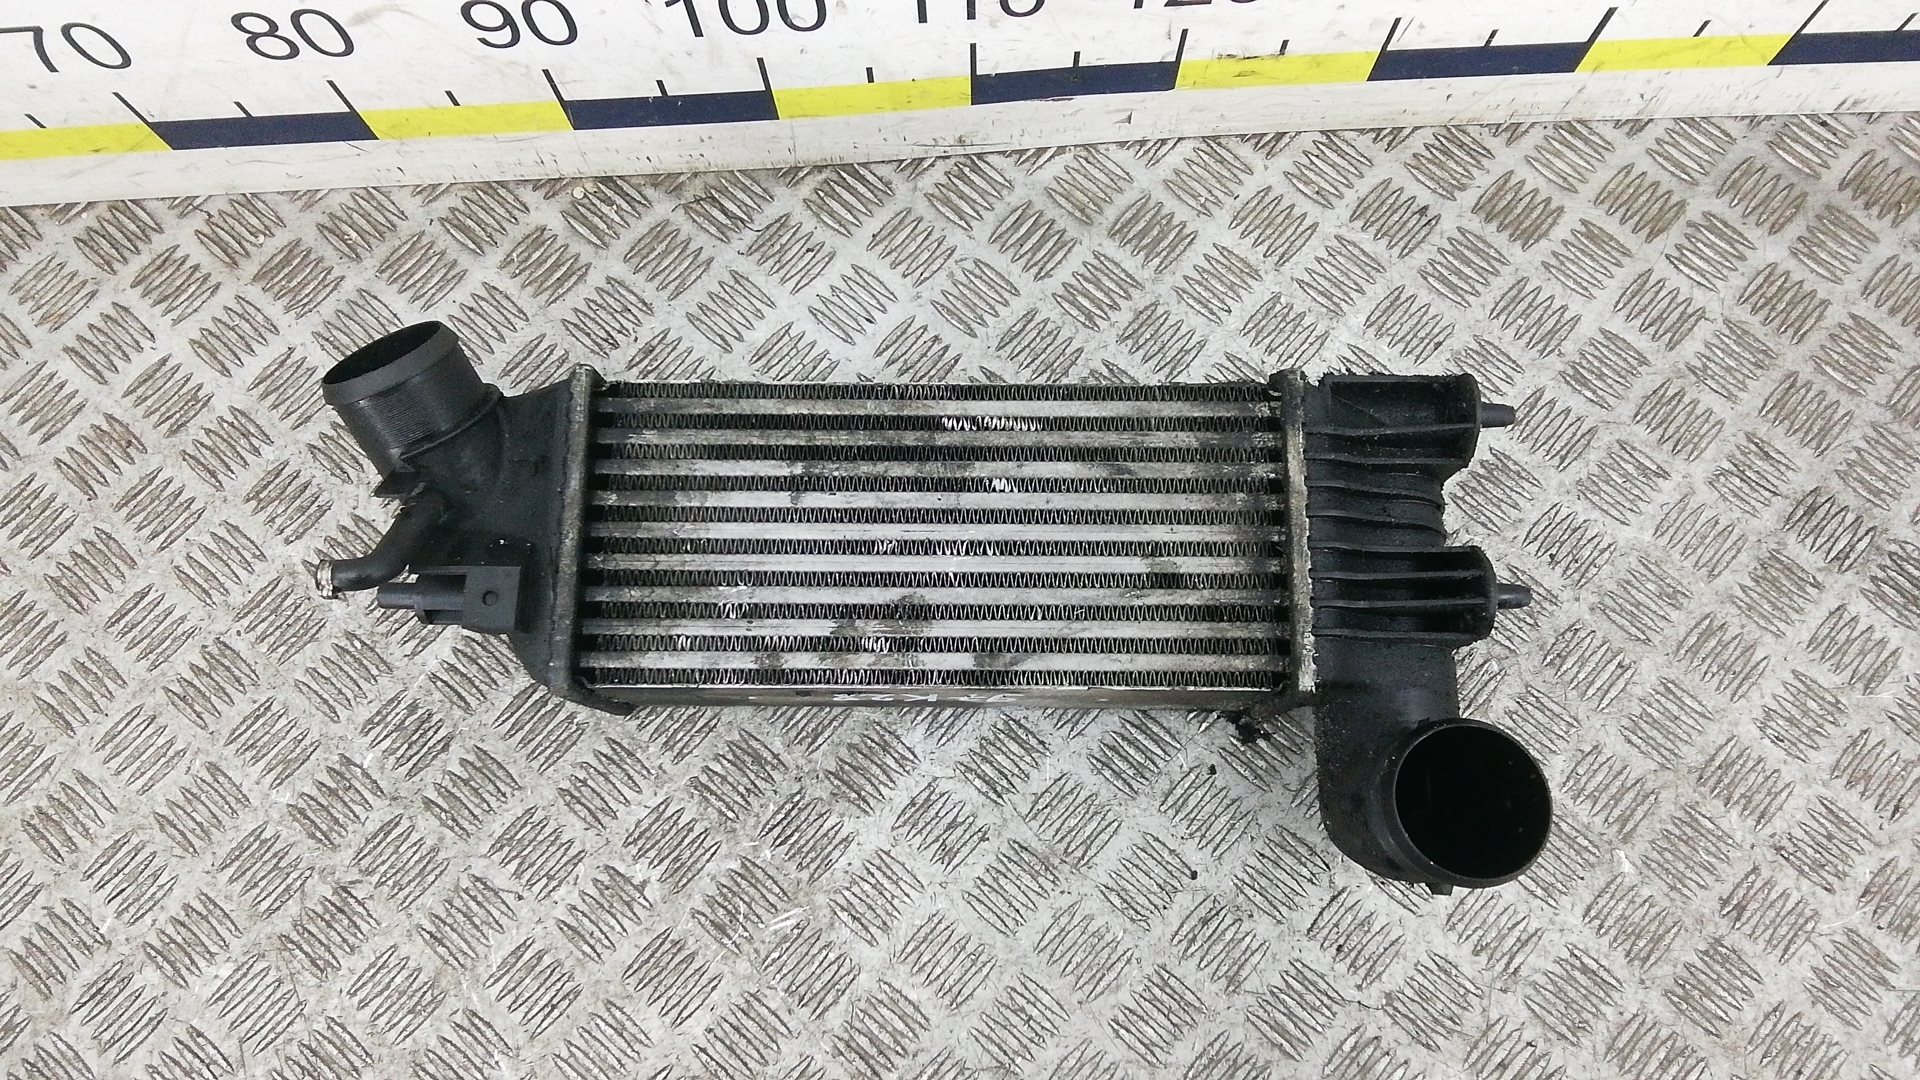 Радиатор интеркуллера, PEUGEOT, 607, 2004